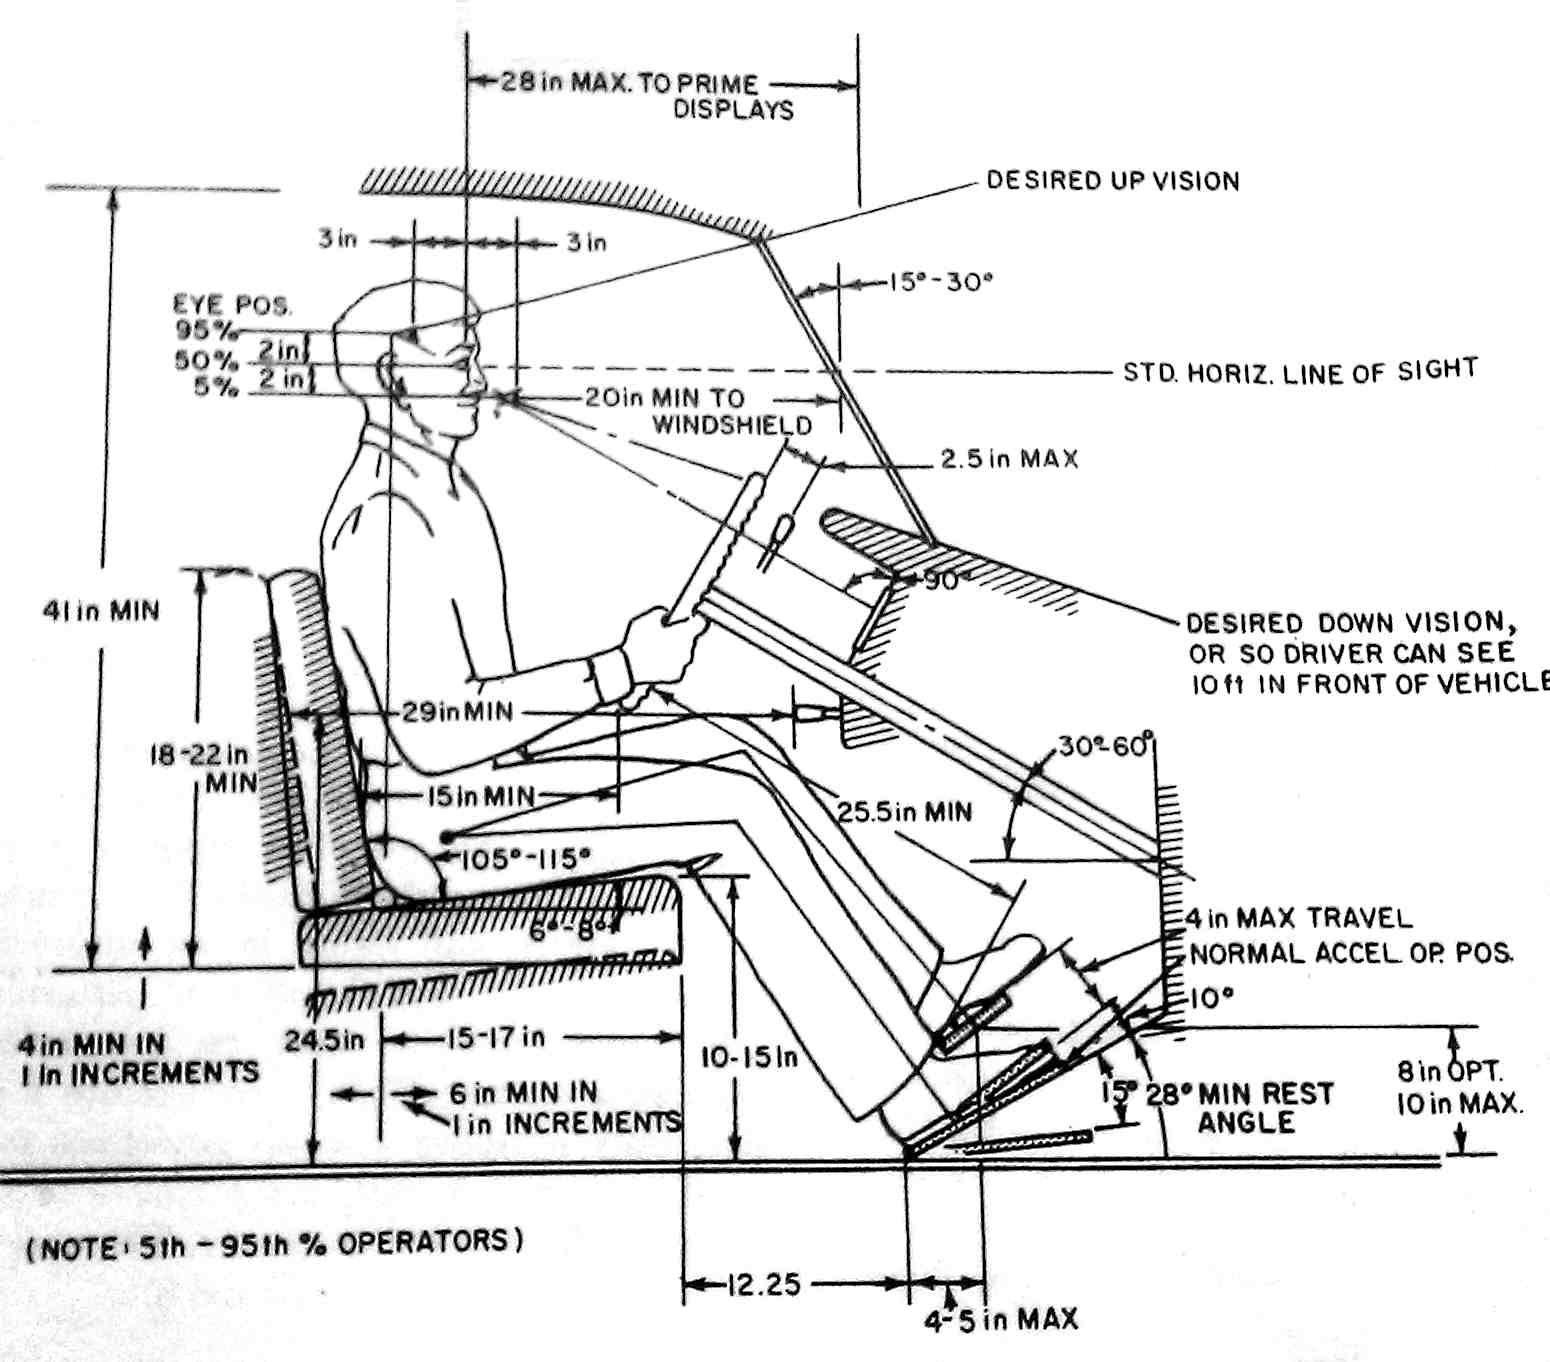 Ergonomic Chair Design Guidelines Doc Mcstuffins Table And Set Ergonomics Поиск в Google и